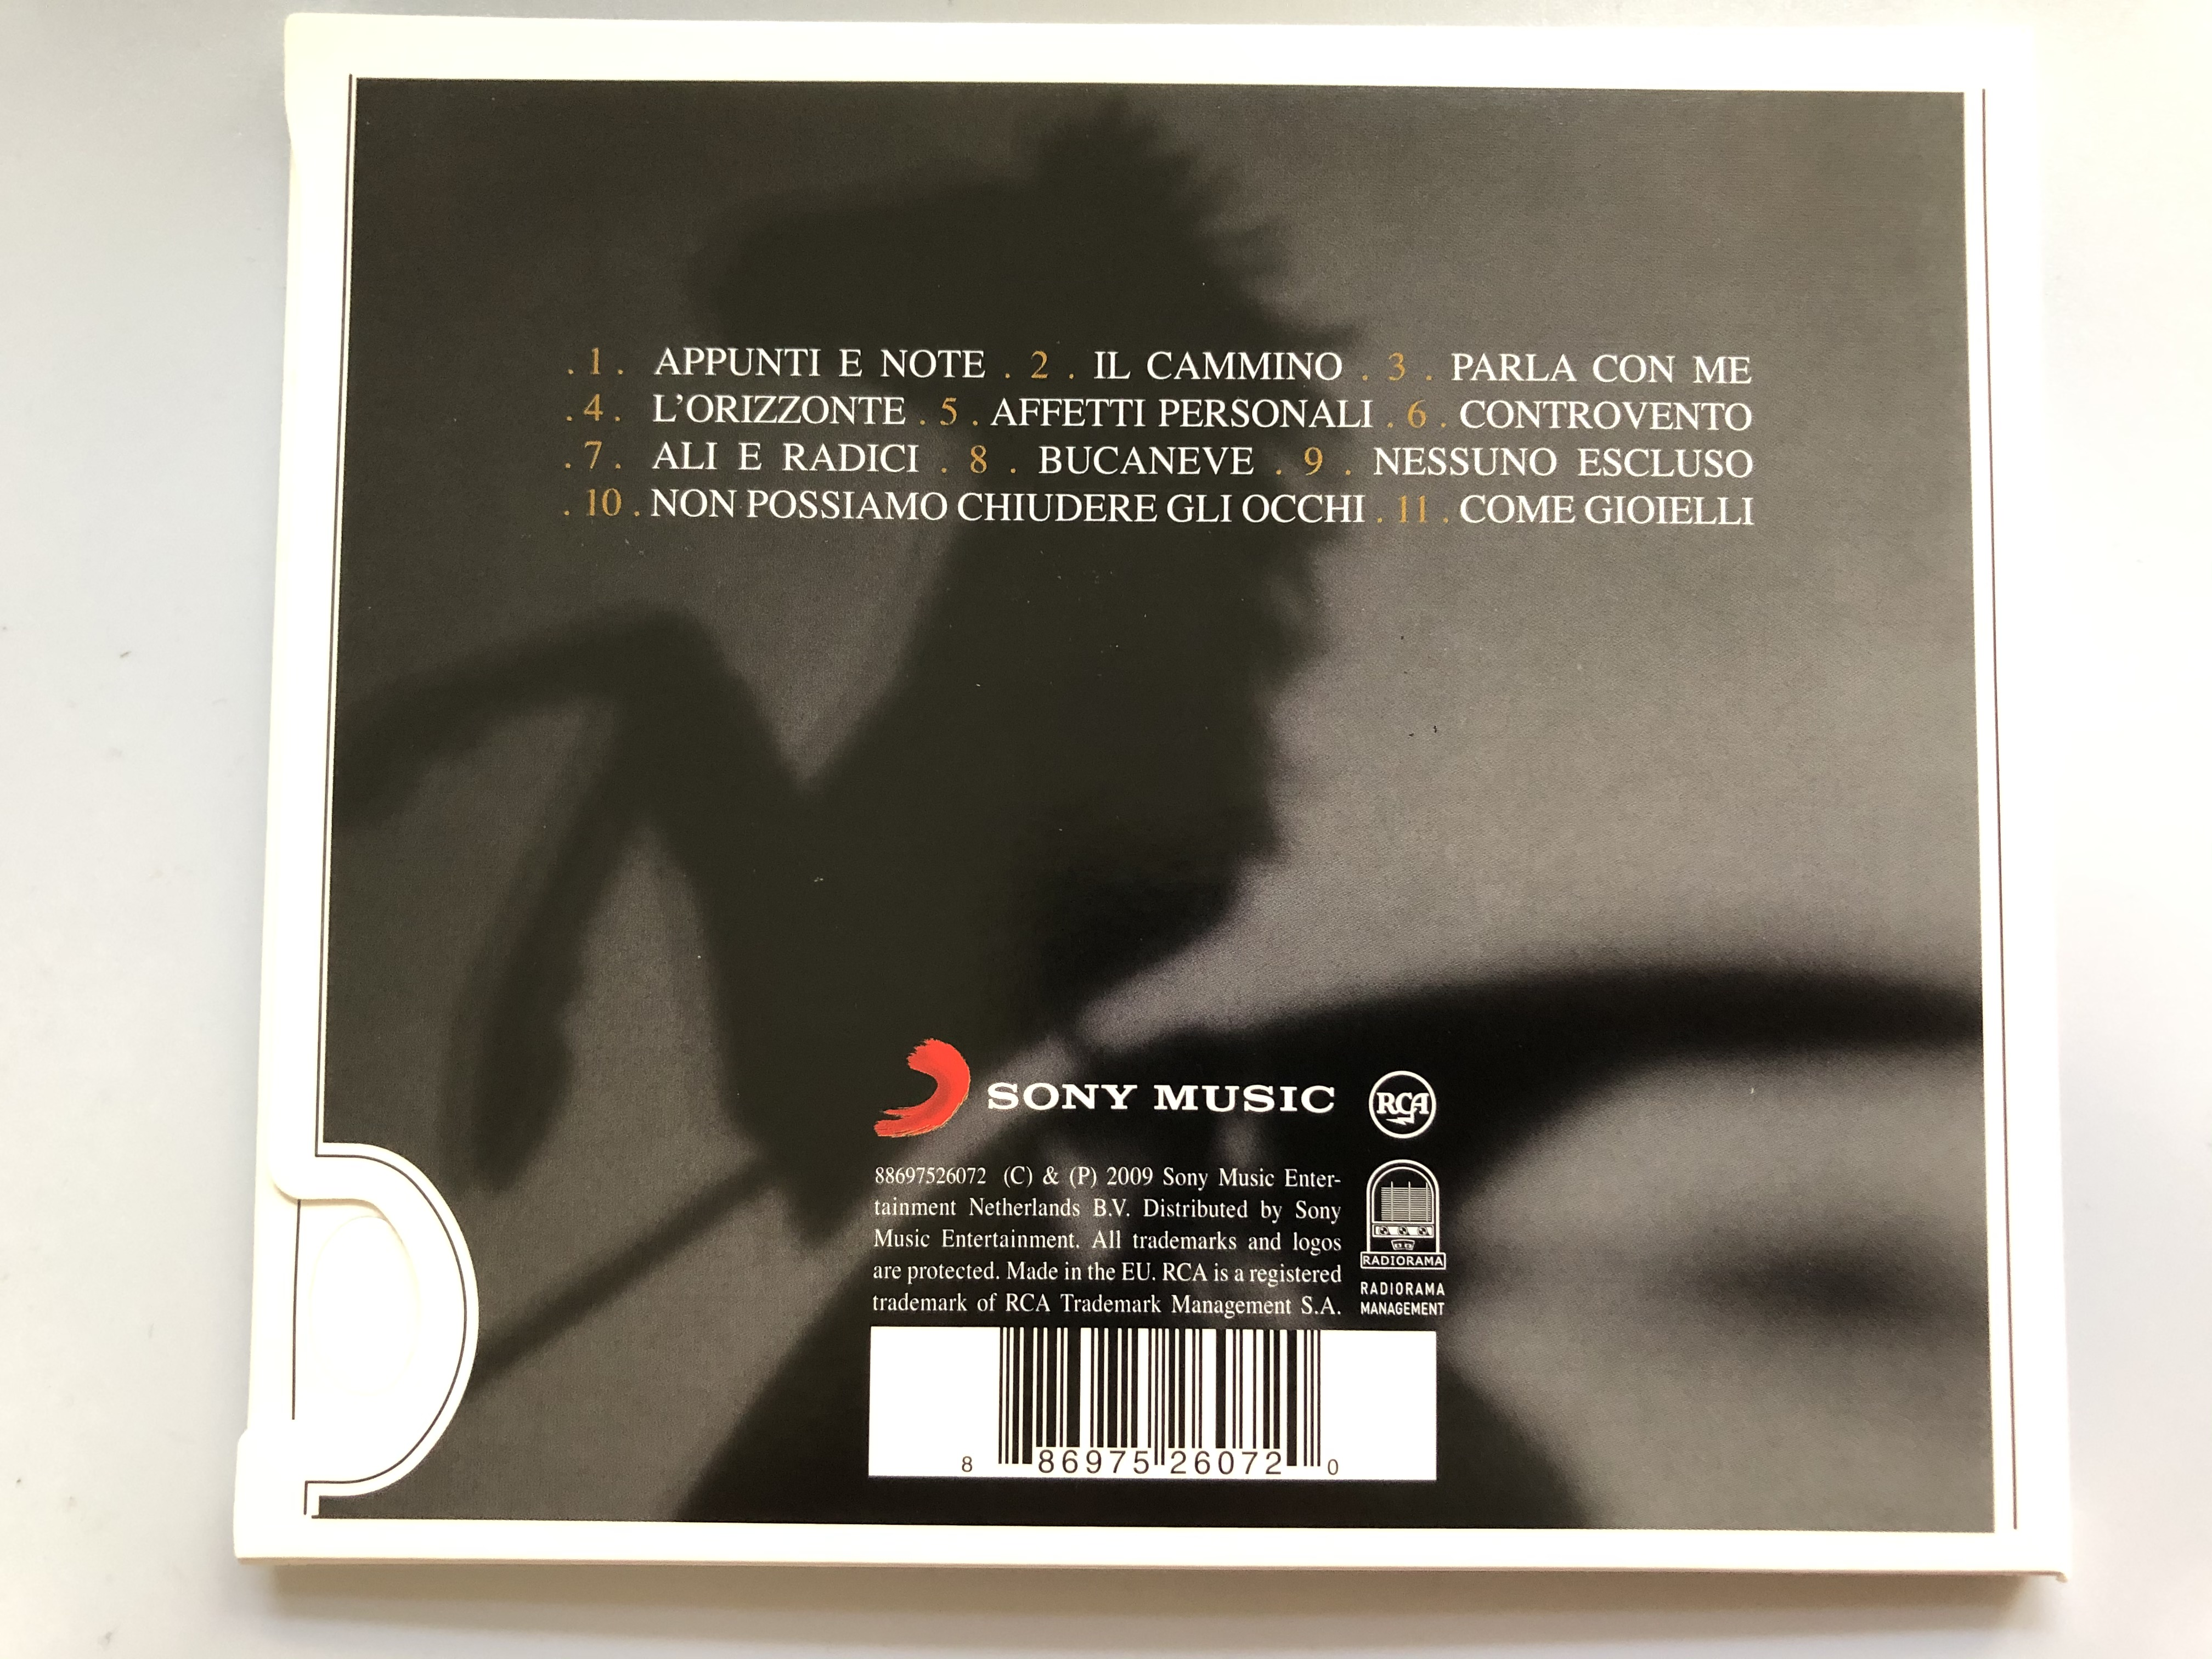 eros-ramazzotti-ali-e-radici-sony-music-audio-cd-2009-88697526072-2-.jpg